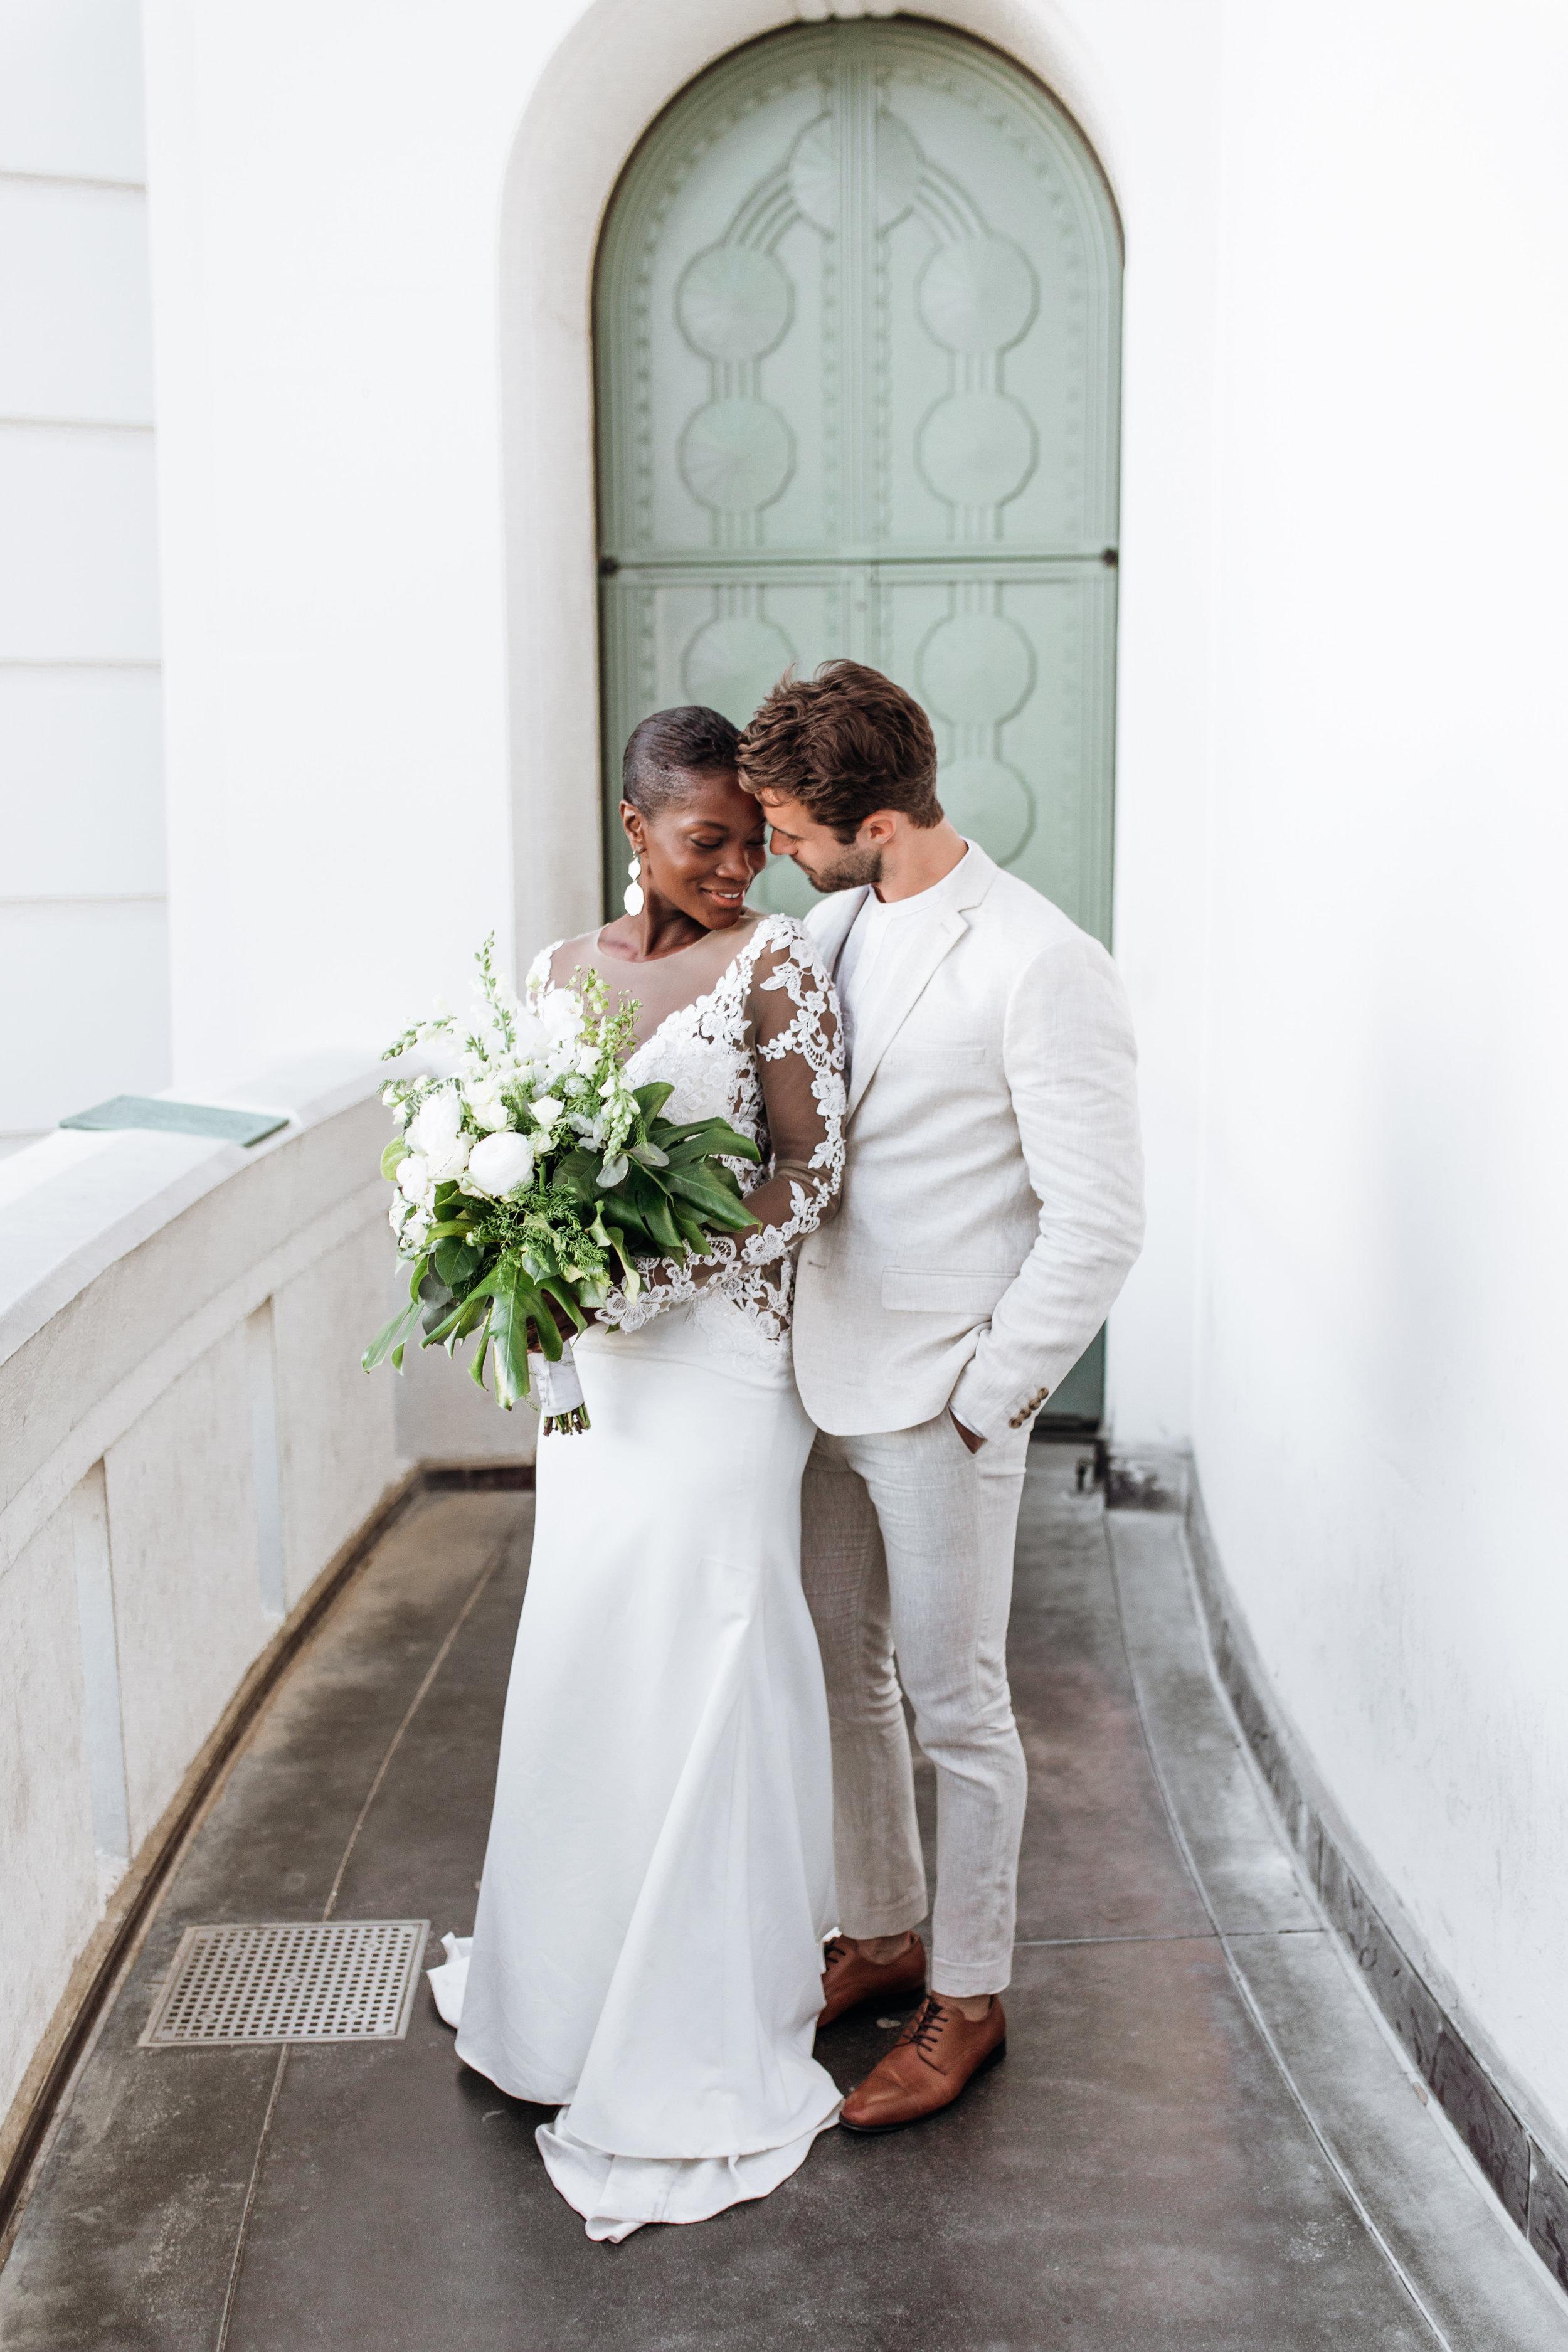 los-angeles-california-griffith-observatory-wedding-bridal-photography-michael-cozzens-103.jpg